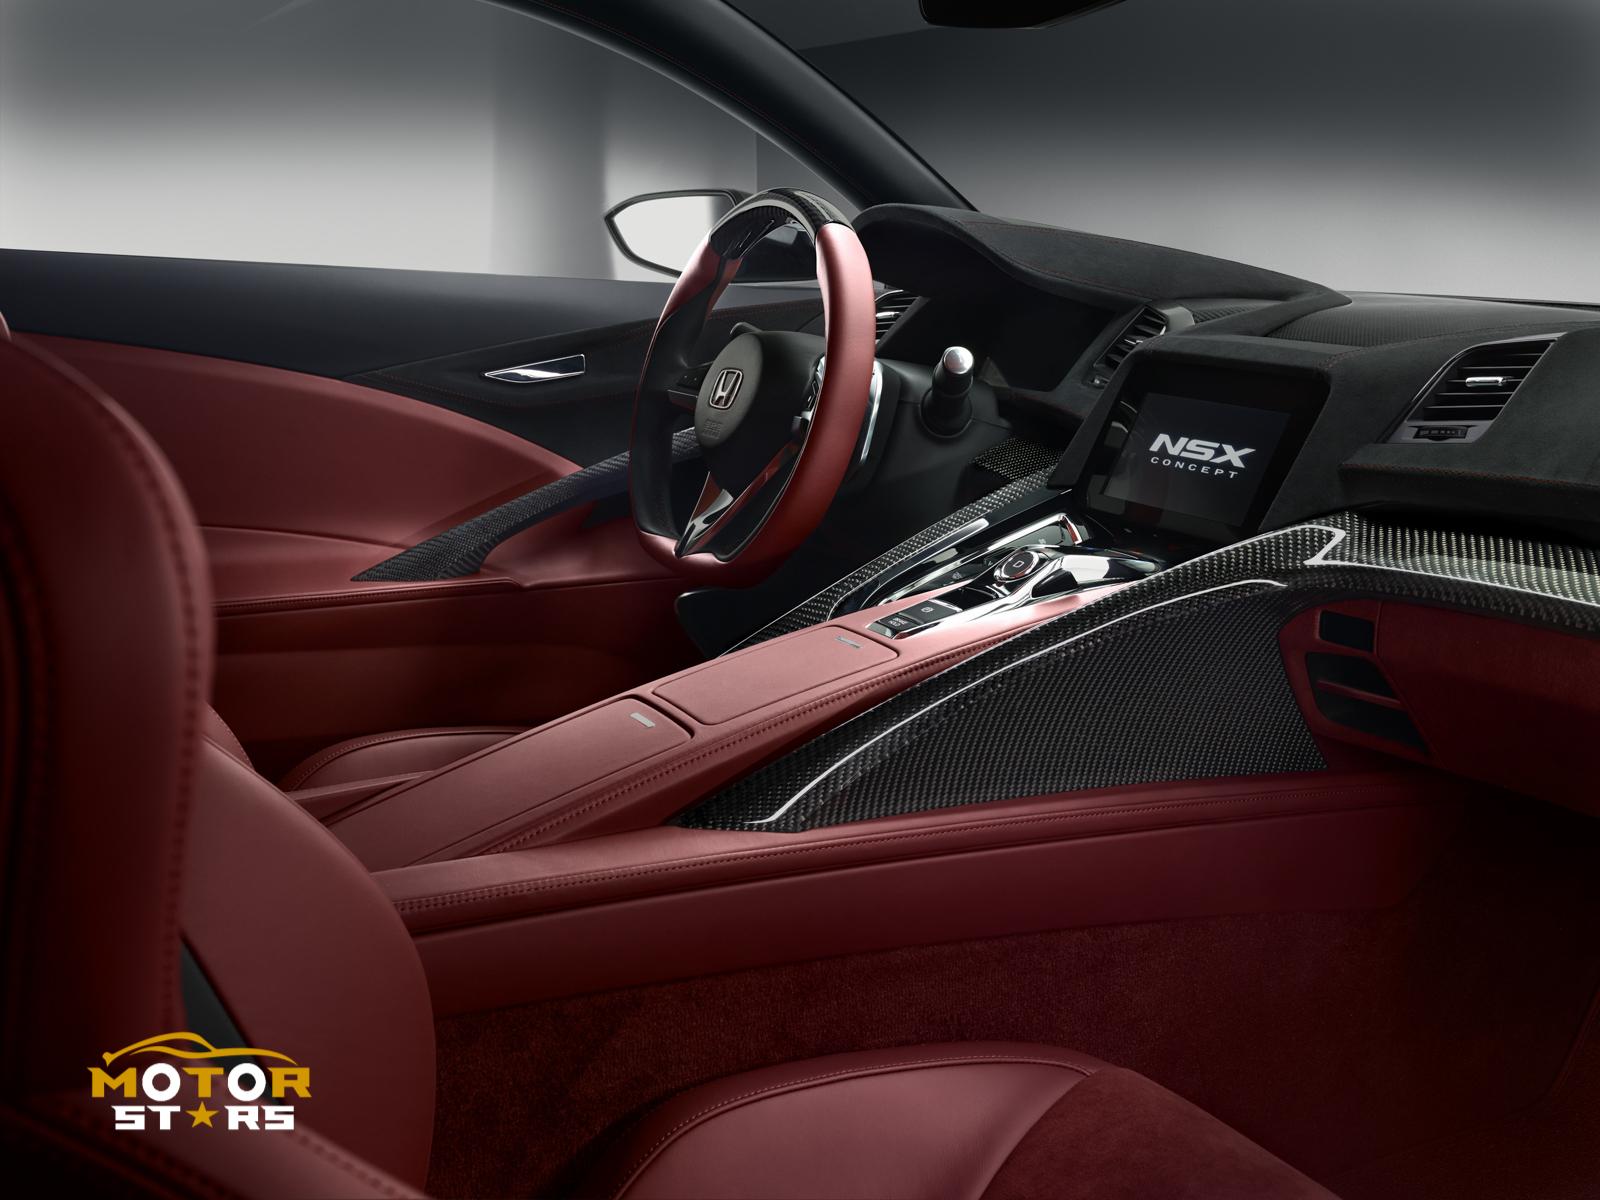 Honda Acura Nsx 2015 Hybrid Electric Supercar 19 2013 Concept Interior Details Motorstars